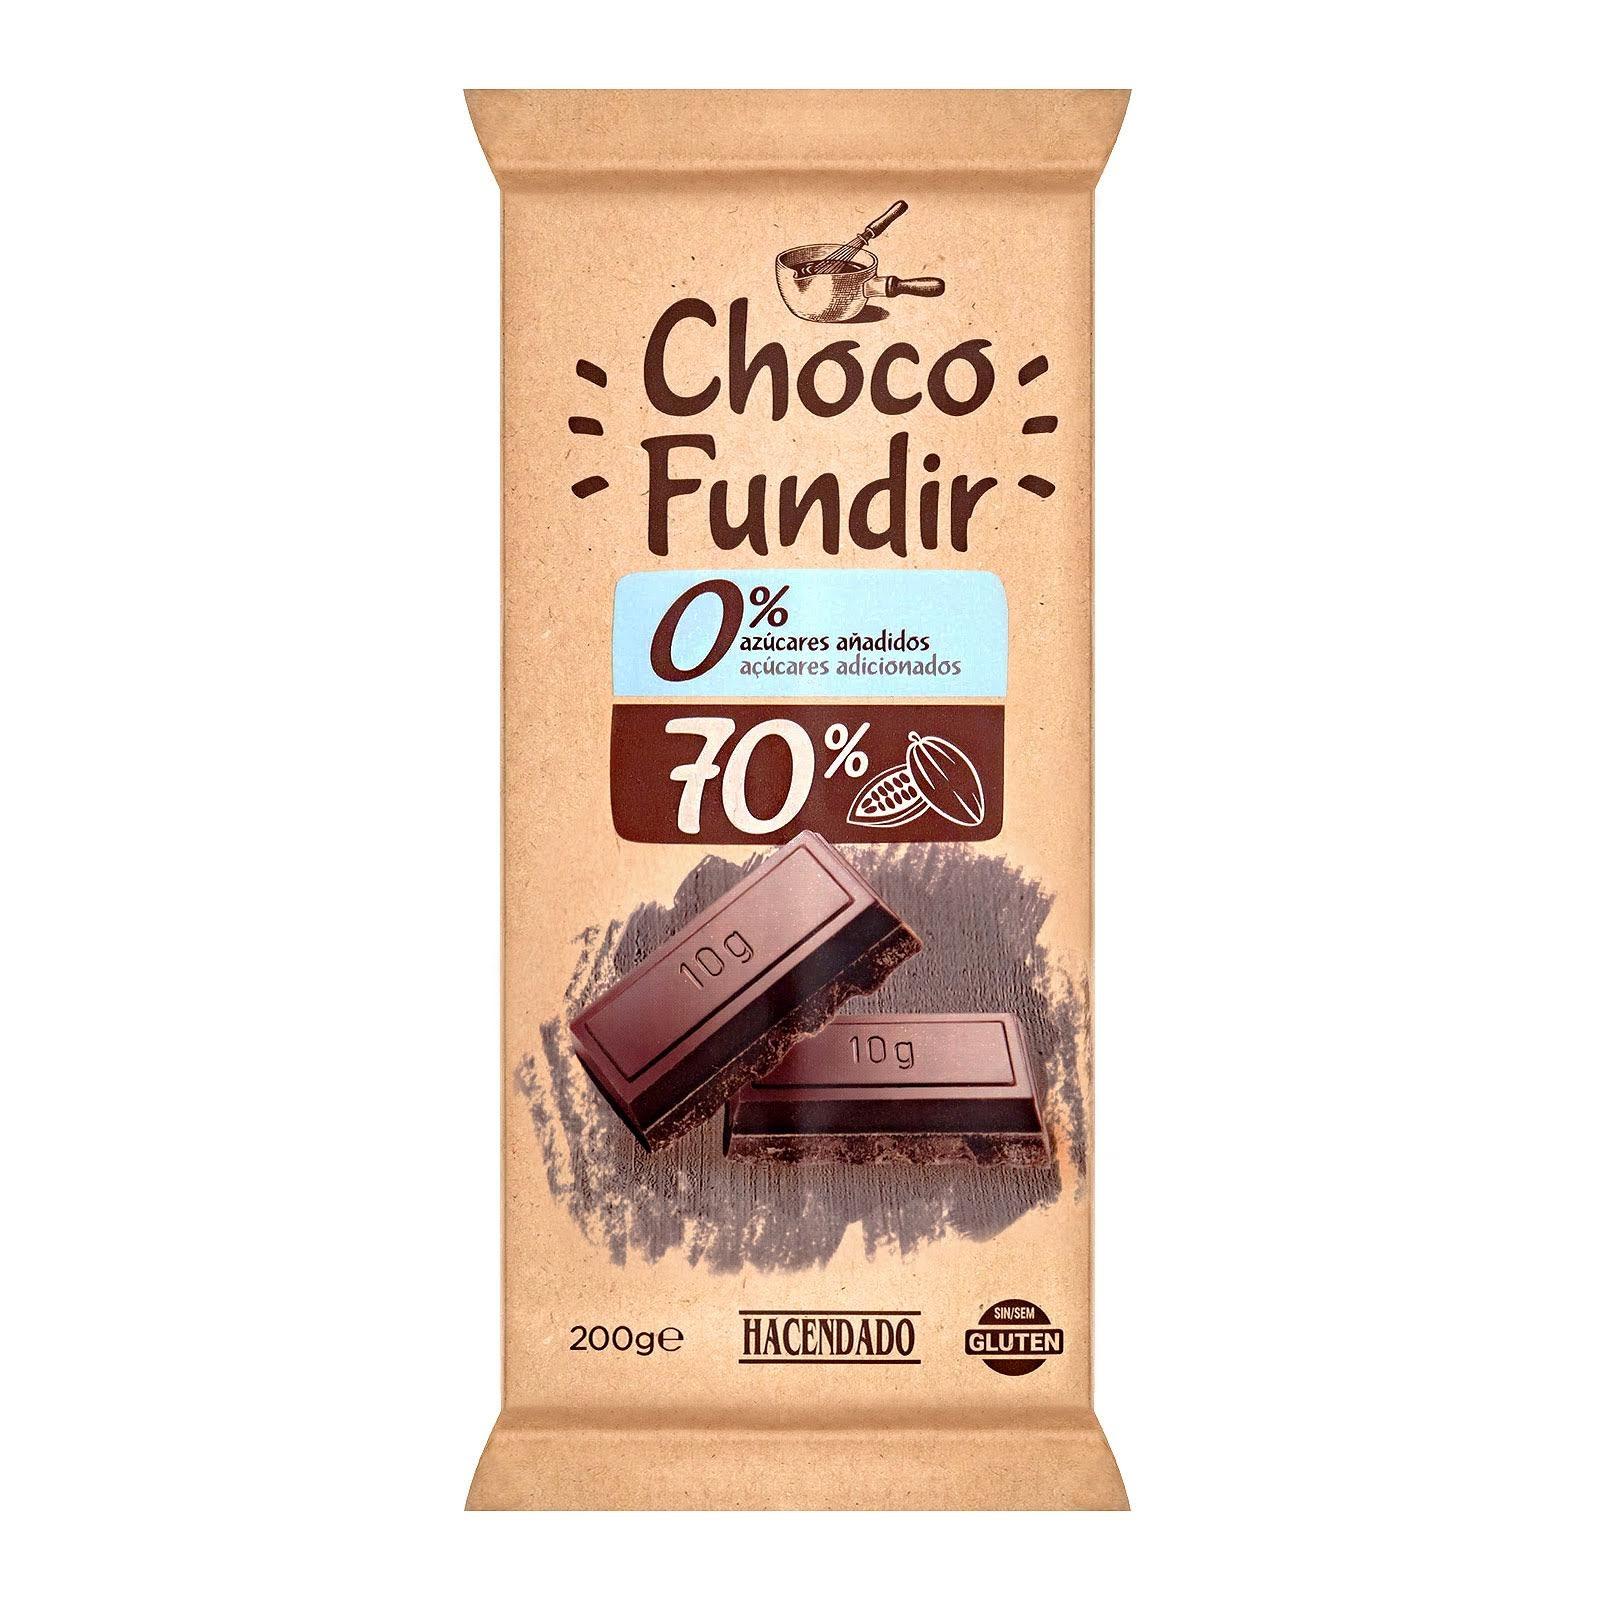 Chocolate negro para fundir 70% de cacao 0% azúcares añadidos Hacendado